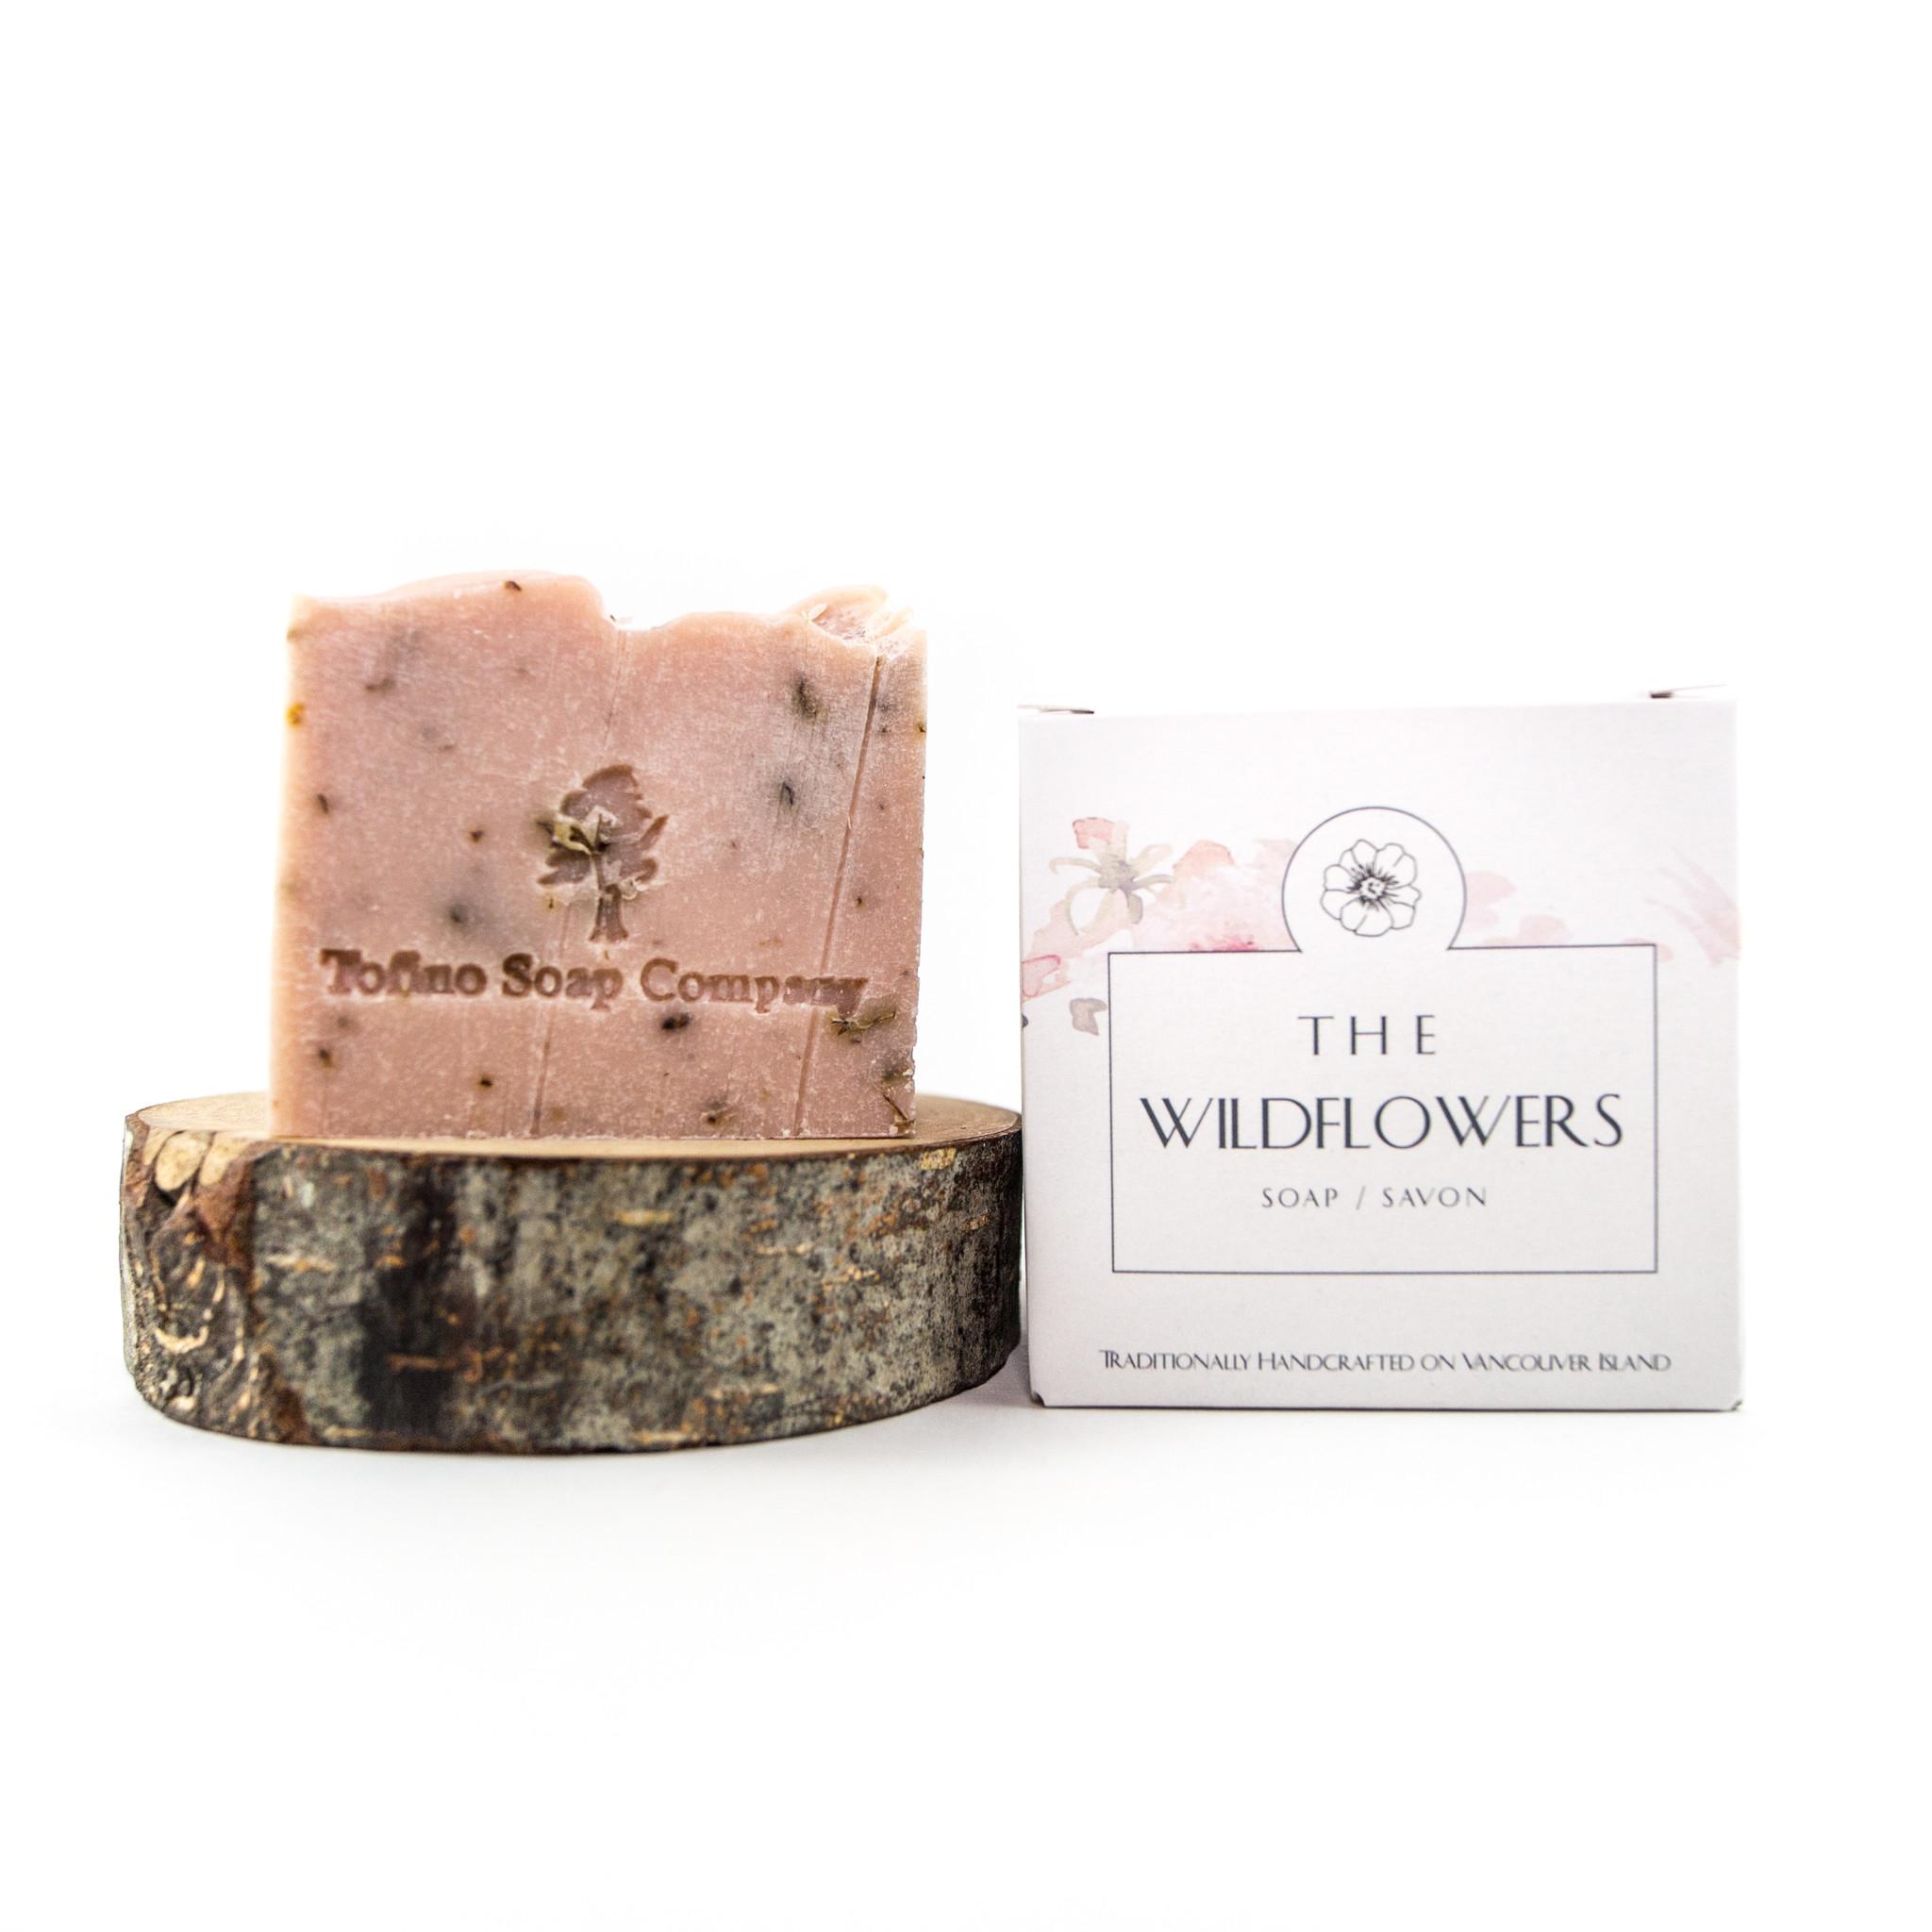 Wildflowers Soap